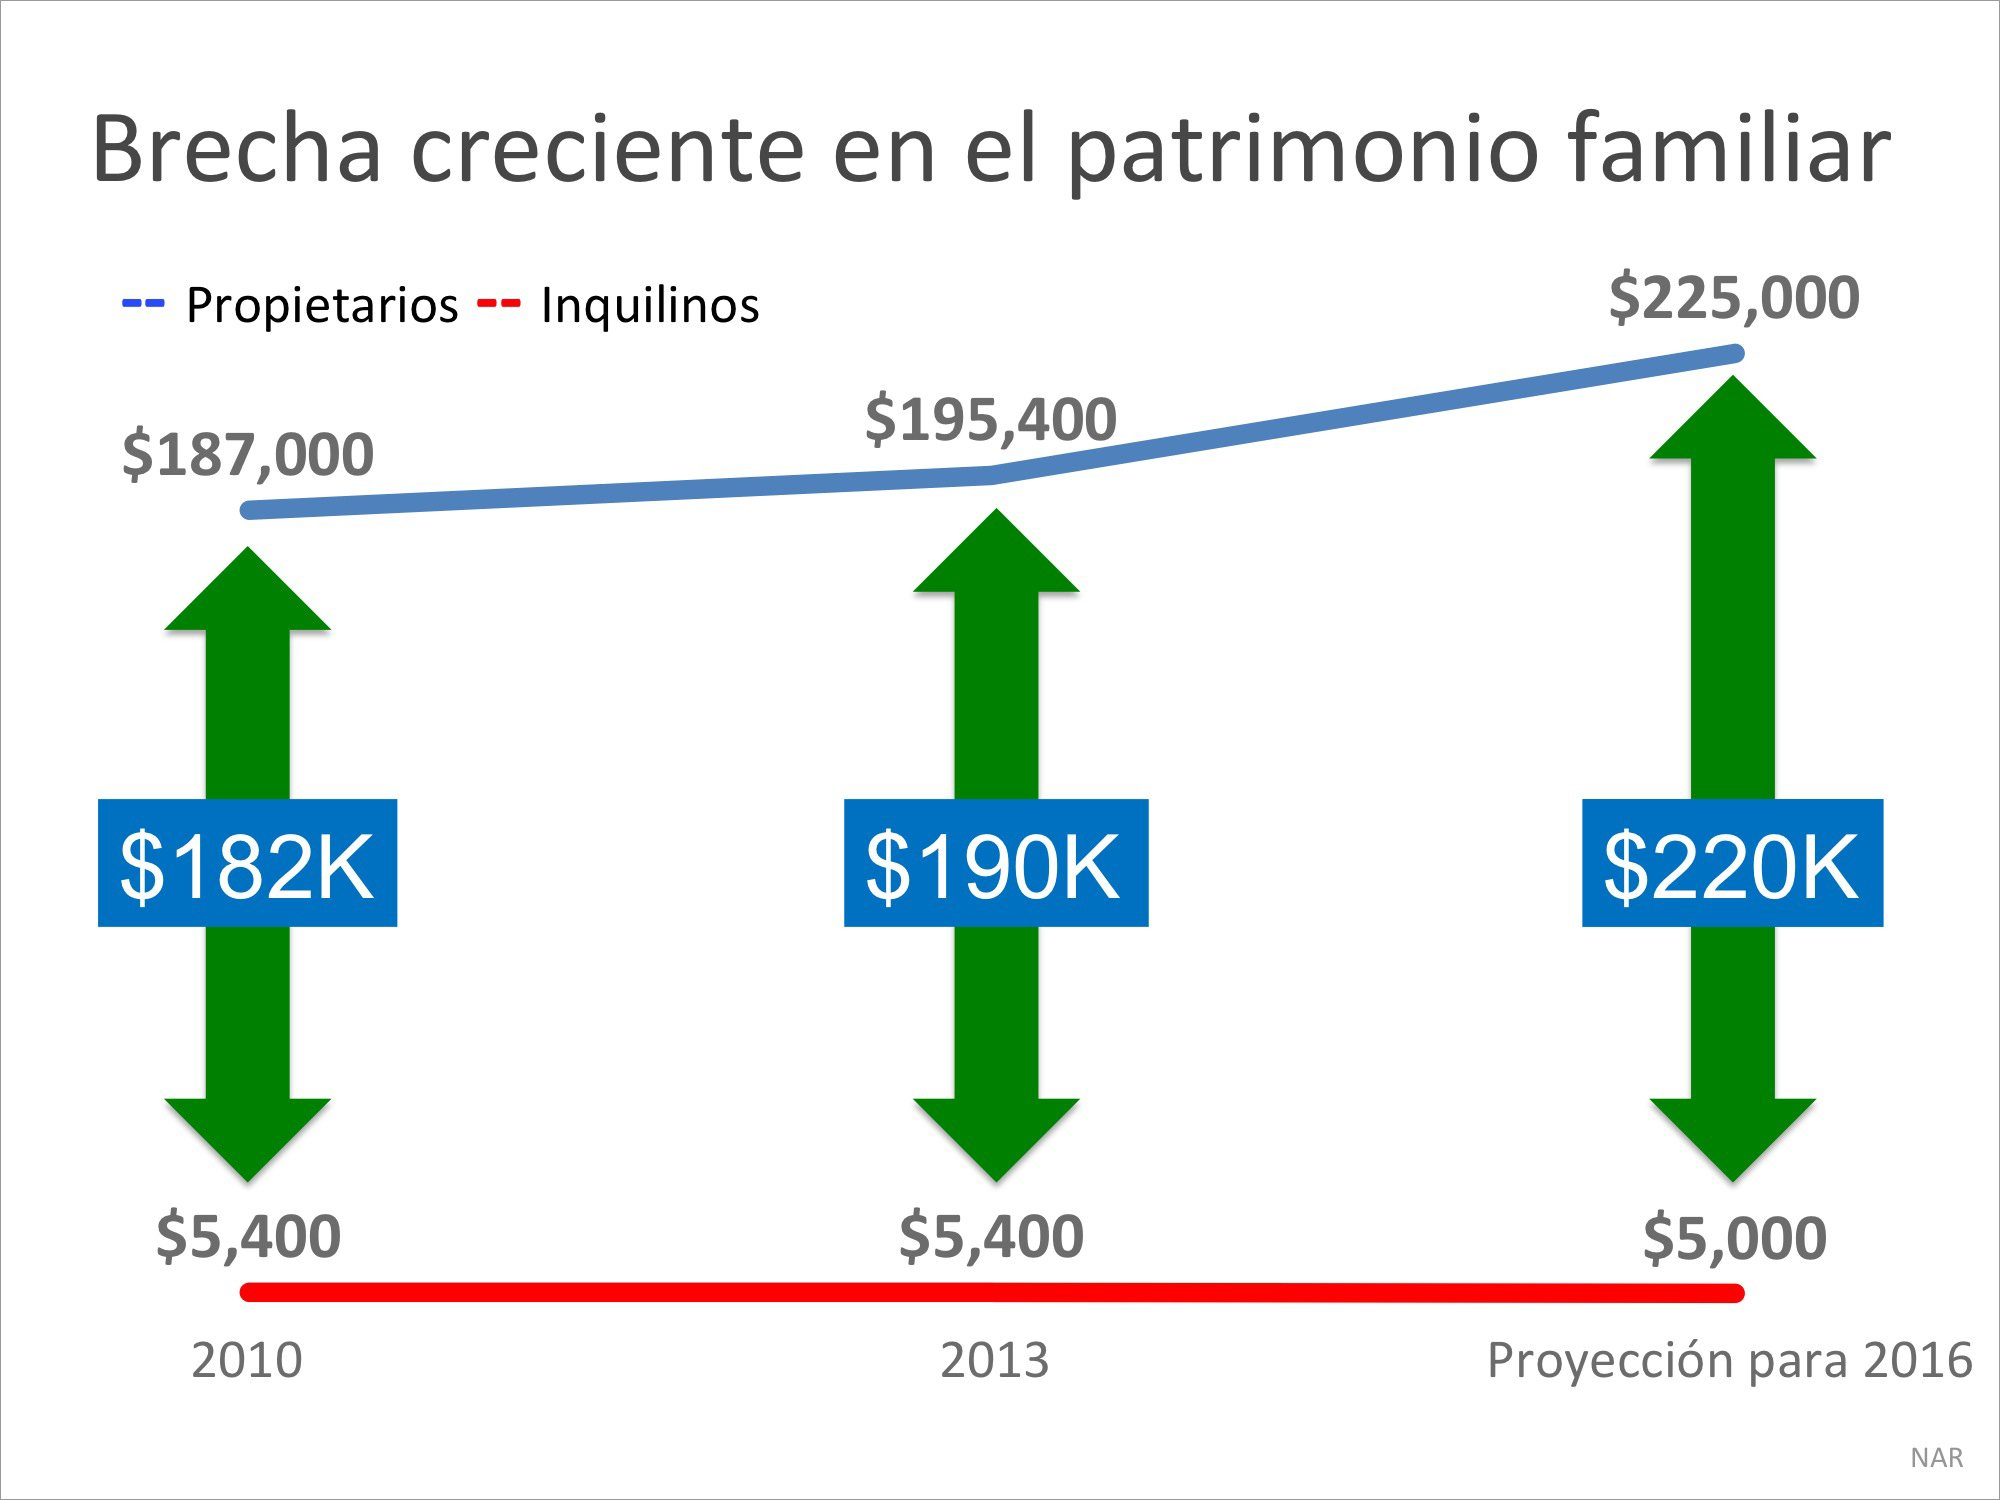 Brecha del patrimonio Familiar| Simplifying The Market